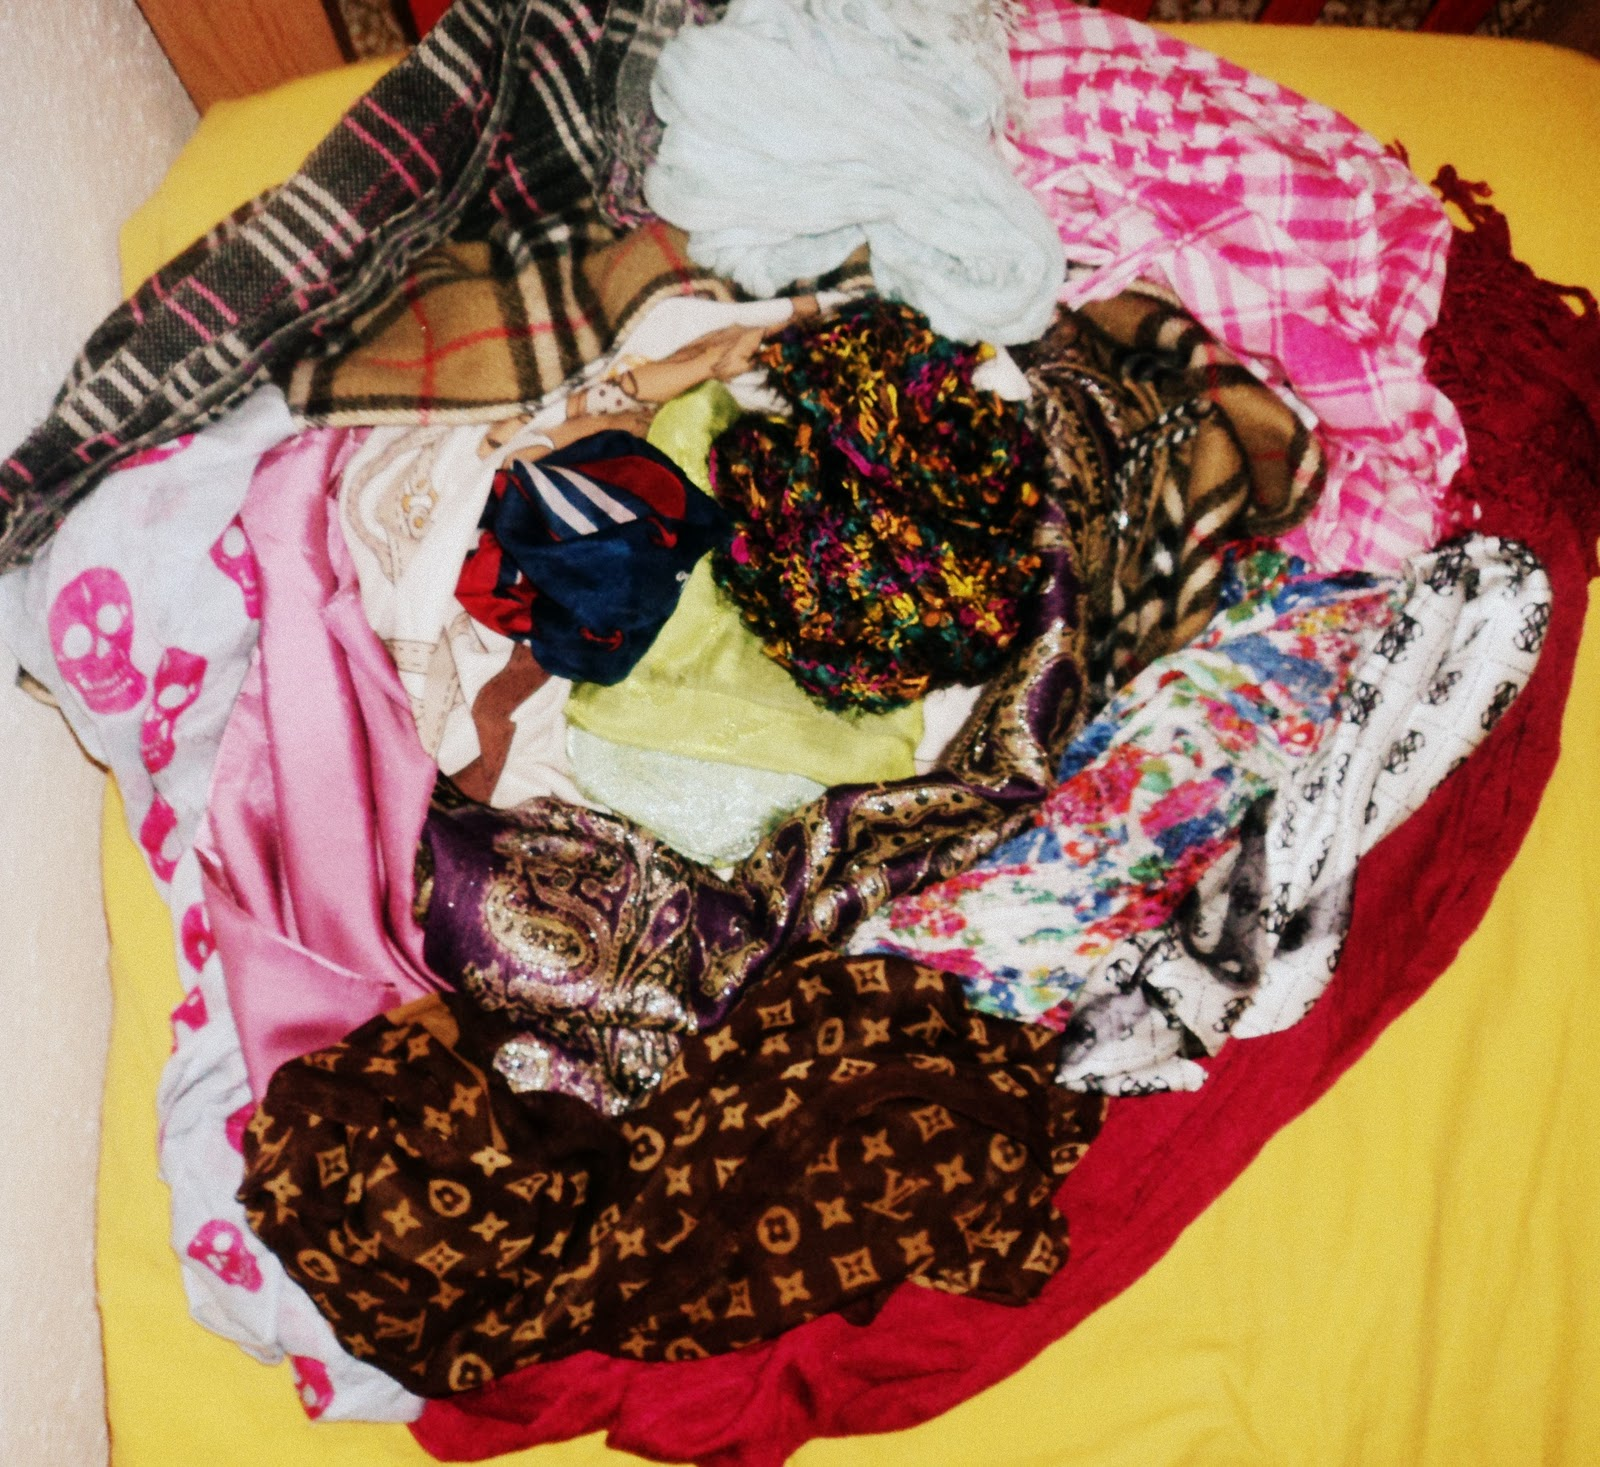 più recente e362a 02002 ✿ Inside Fashion World ✿: Magic scarf and foulard ♡